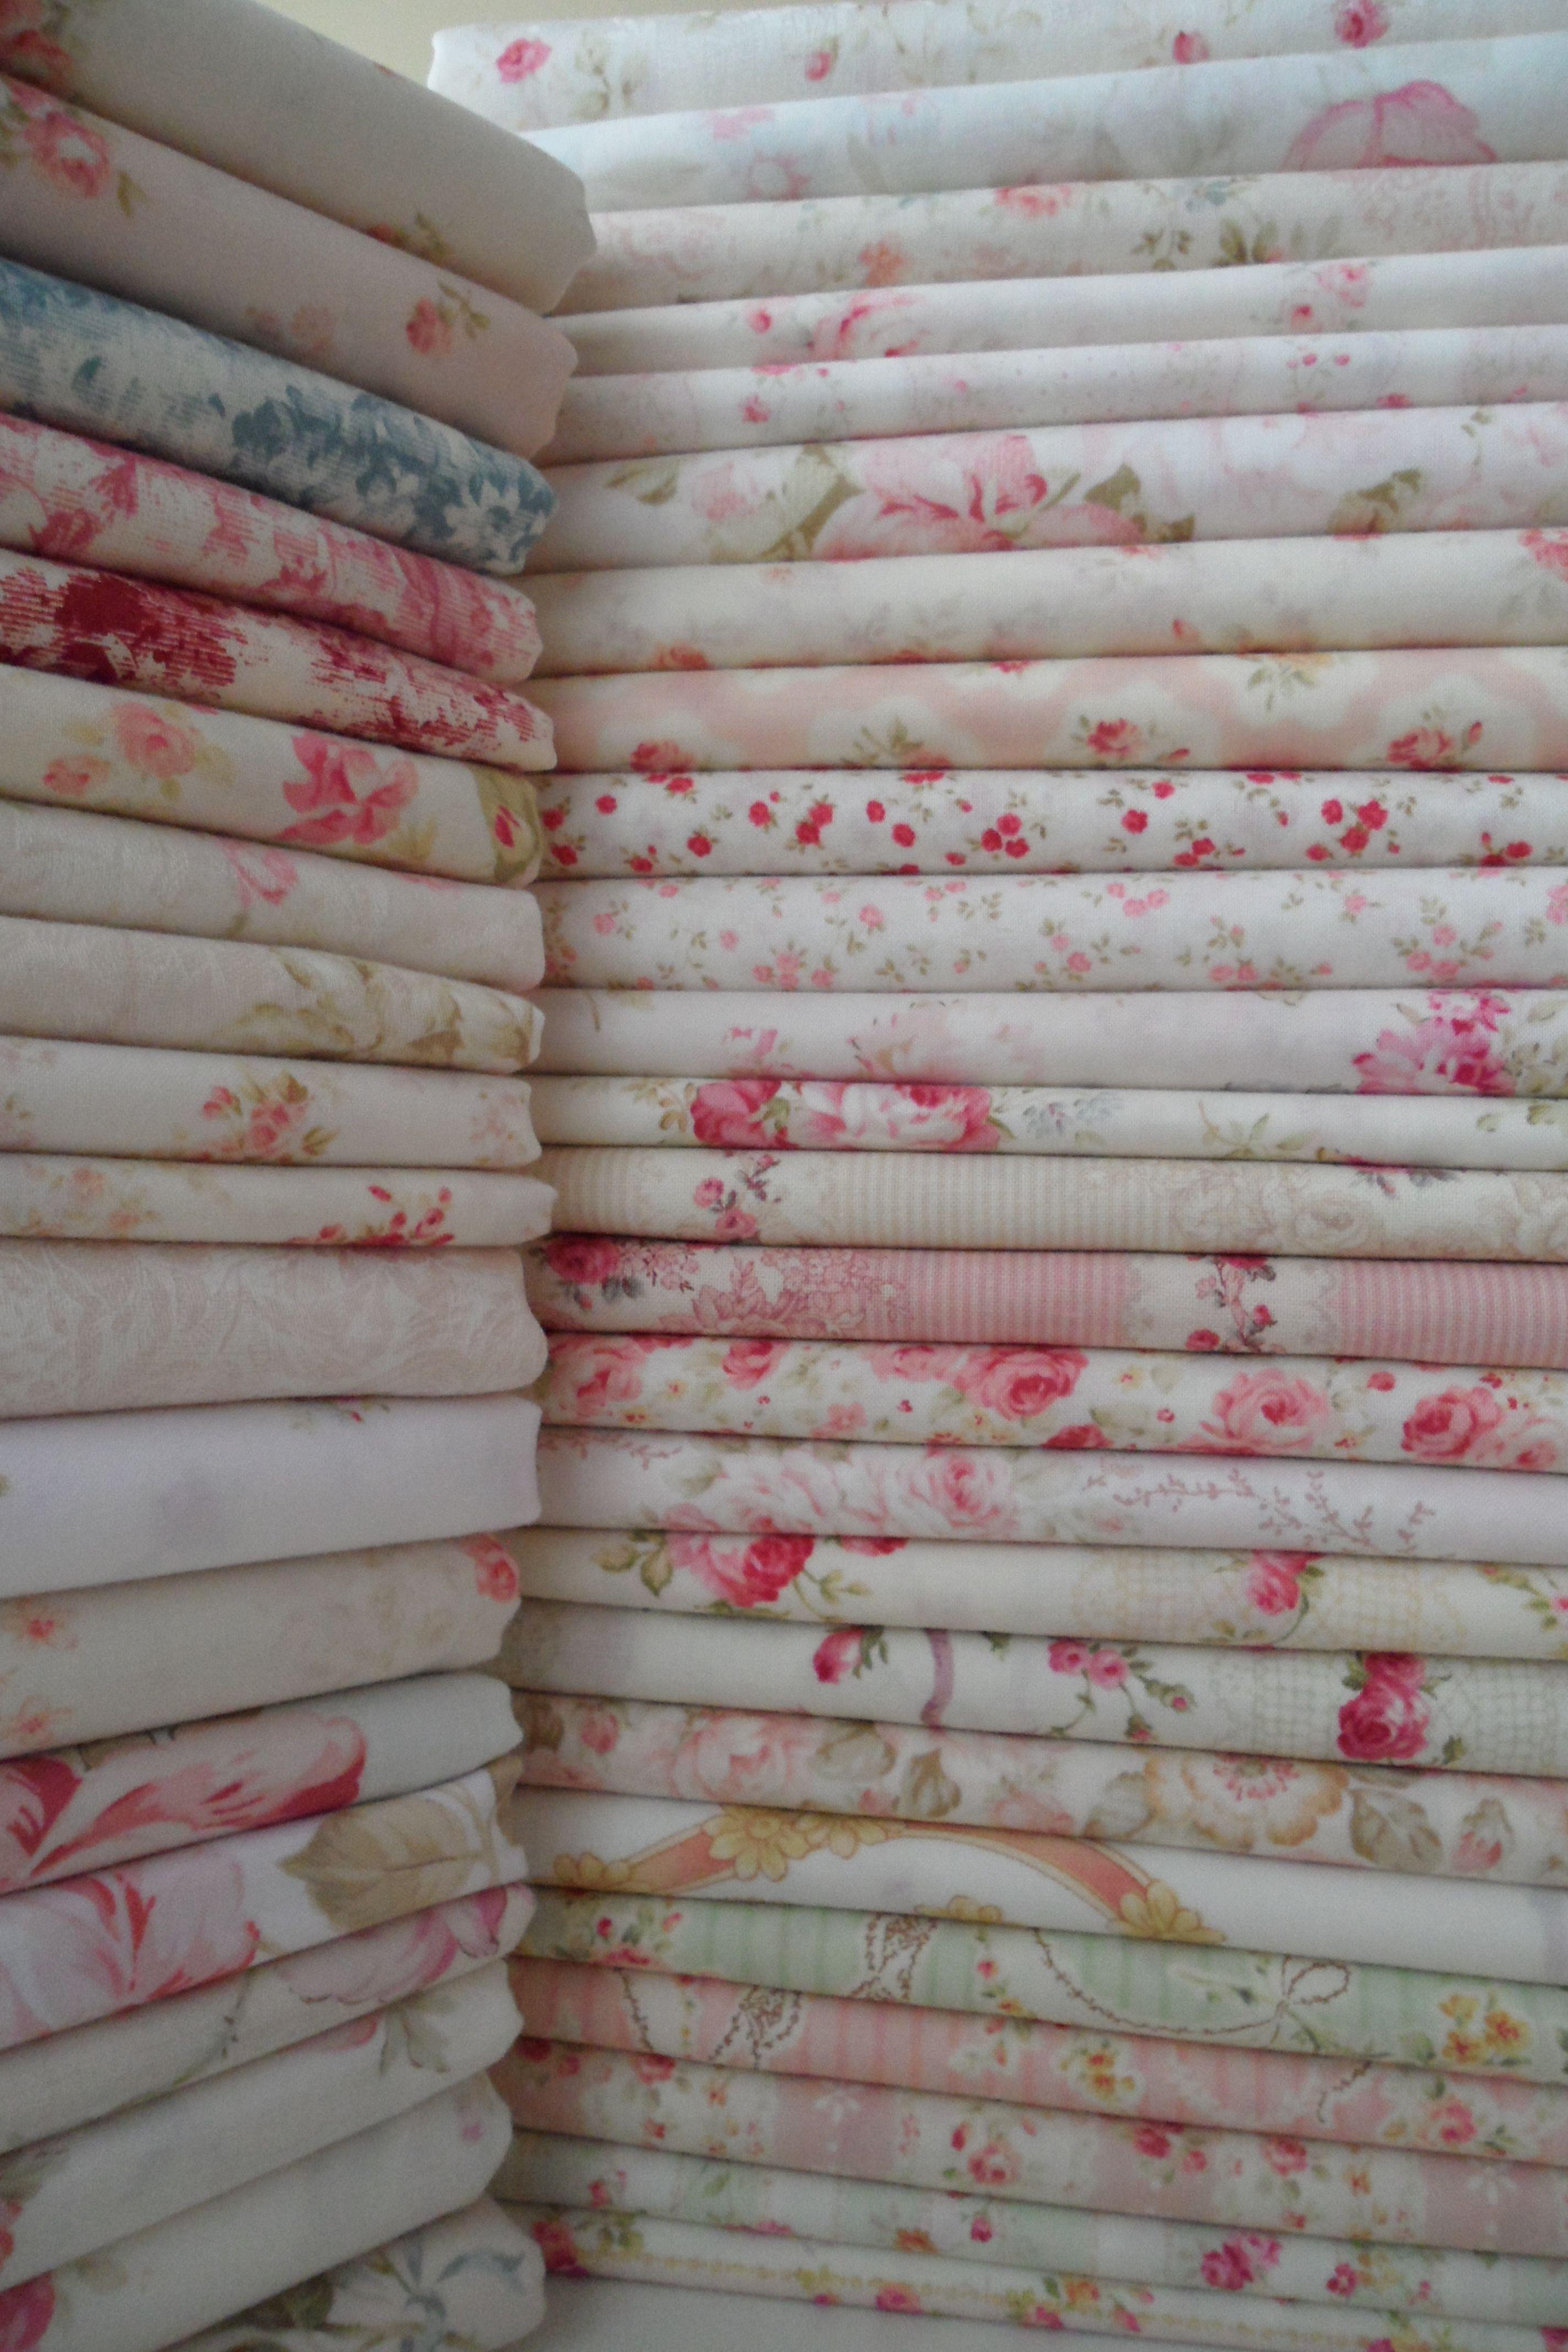 Quilt Gate Mary Rose Fabric. | Fabric Love | Pinterest | Fabrics ... : rose quilt fabric - Adamdwight.com